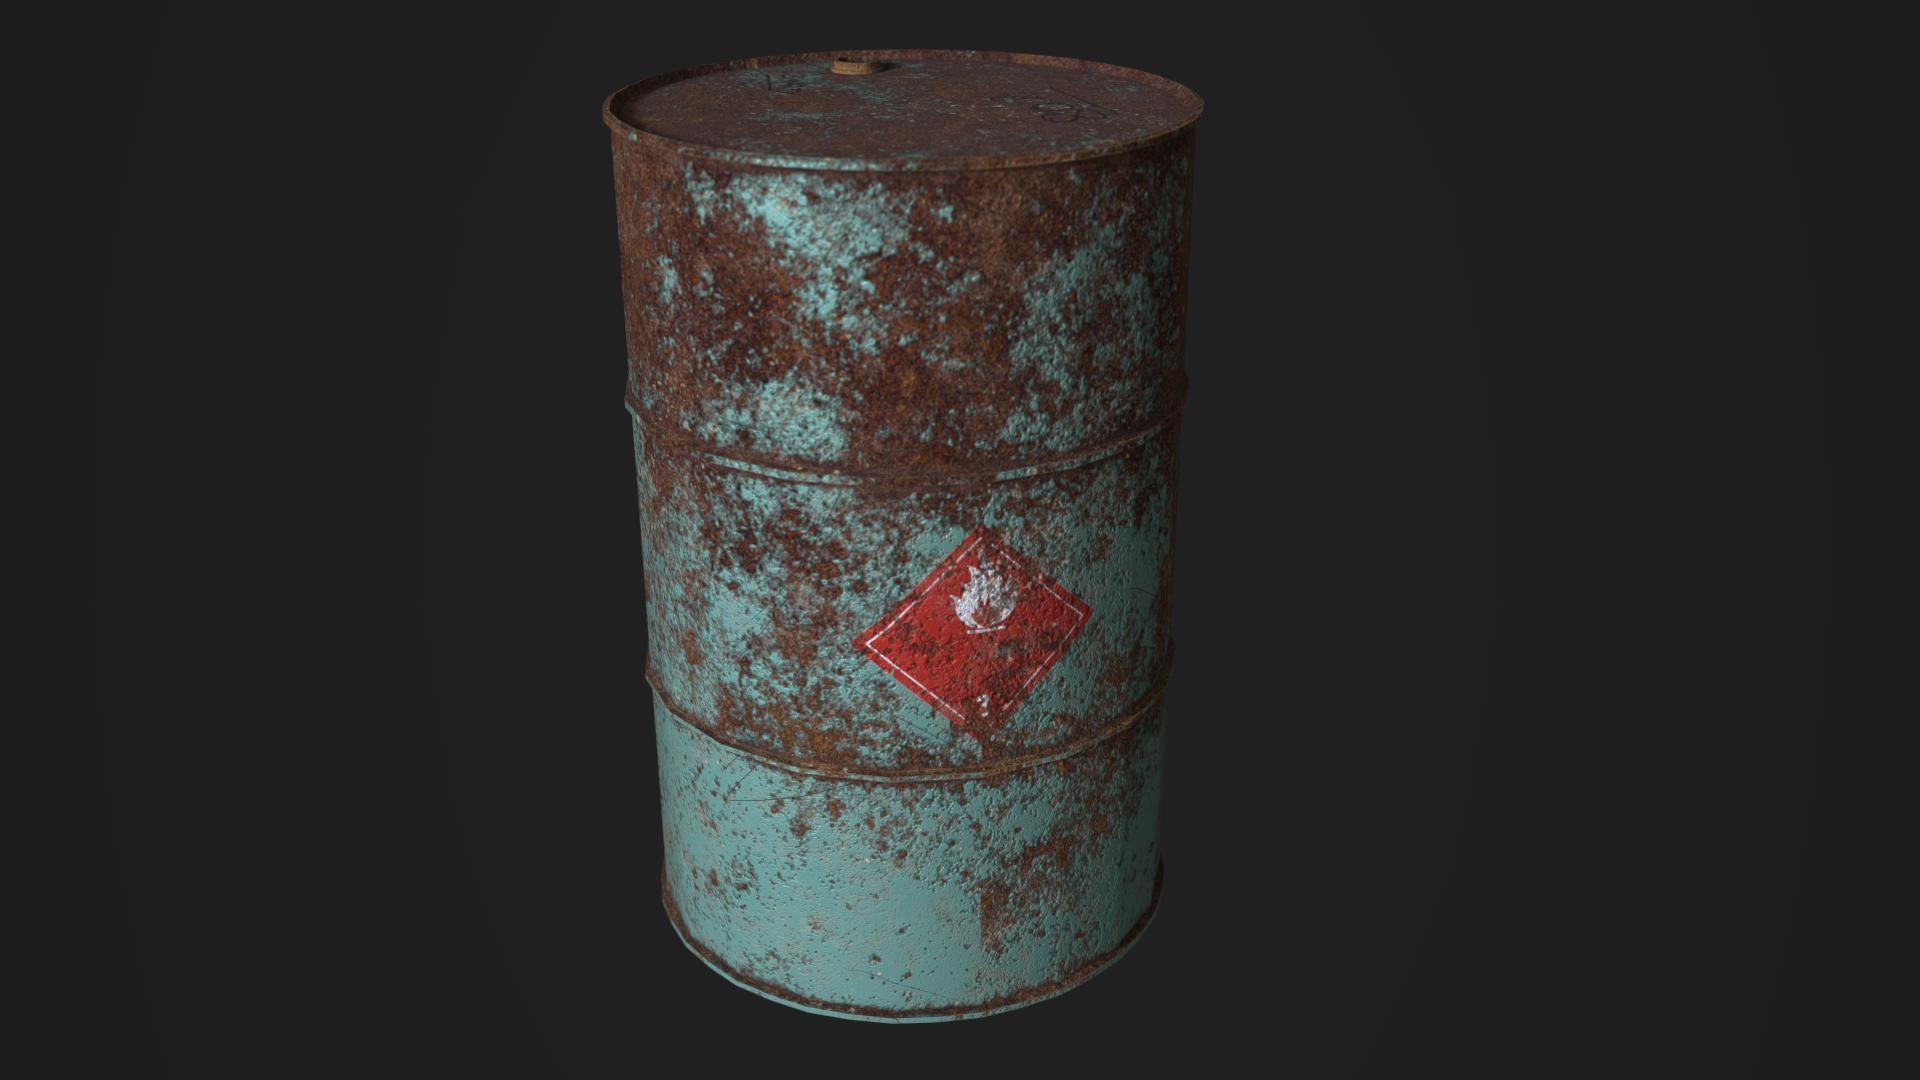 Leonardo iezzi barrel 004